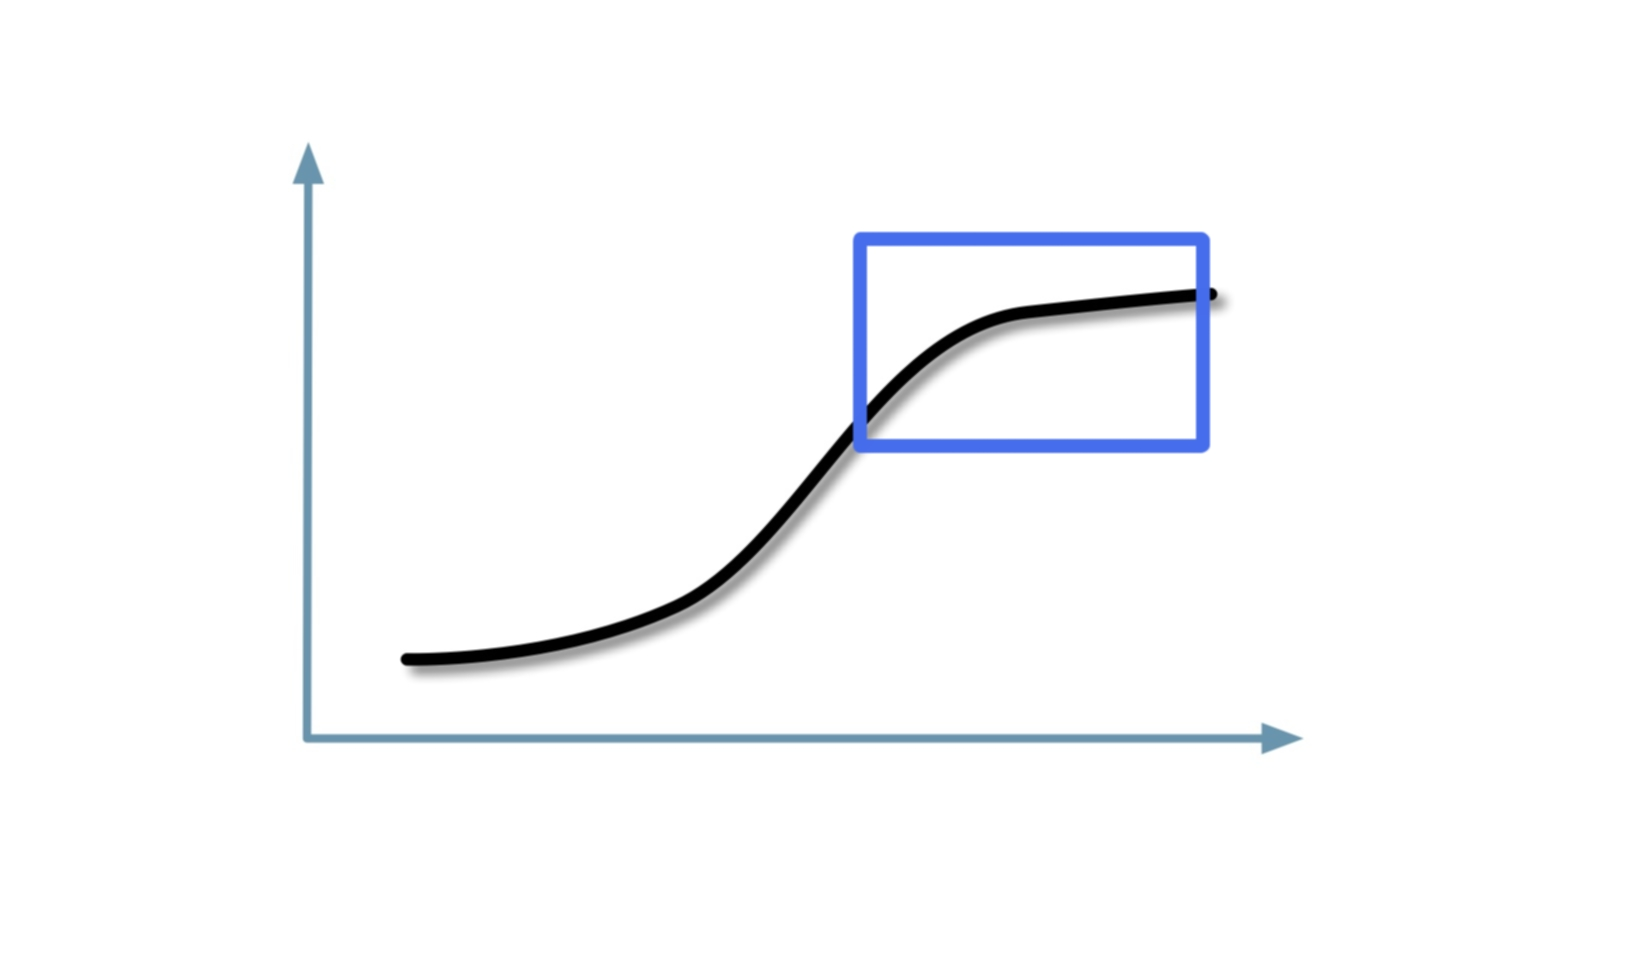 innovation-s-curve-3.jpg